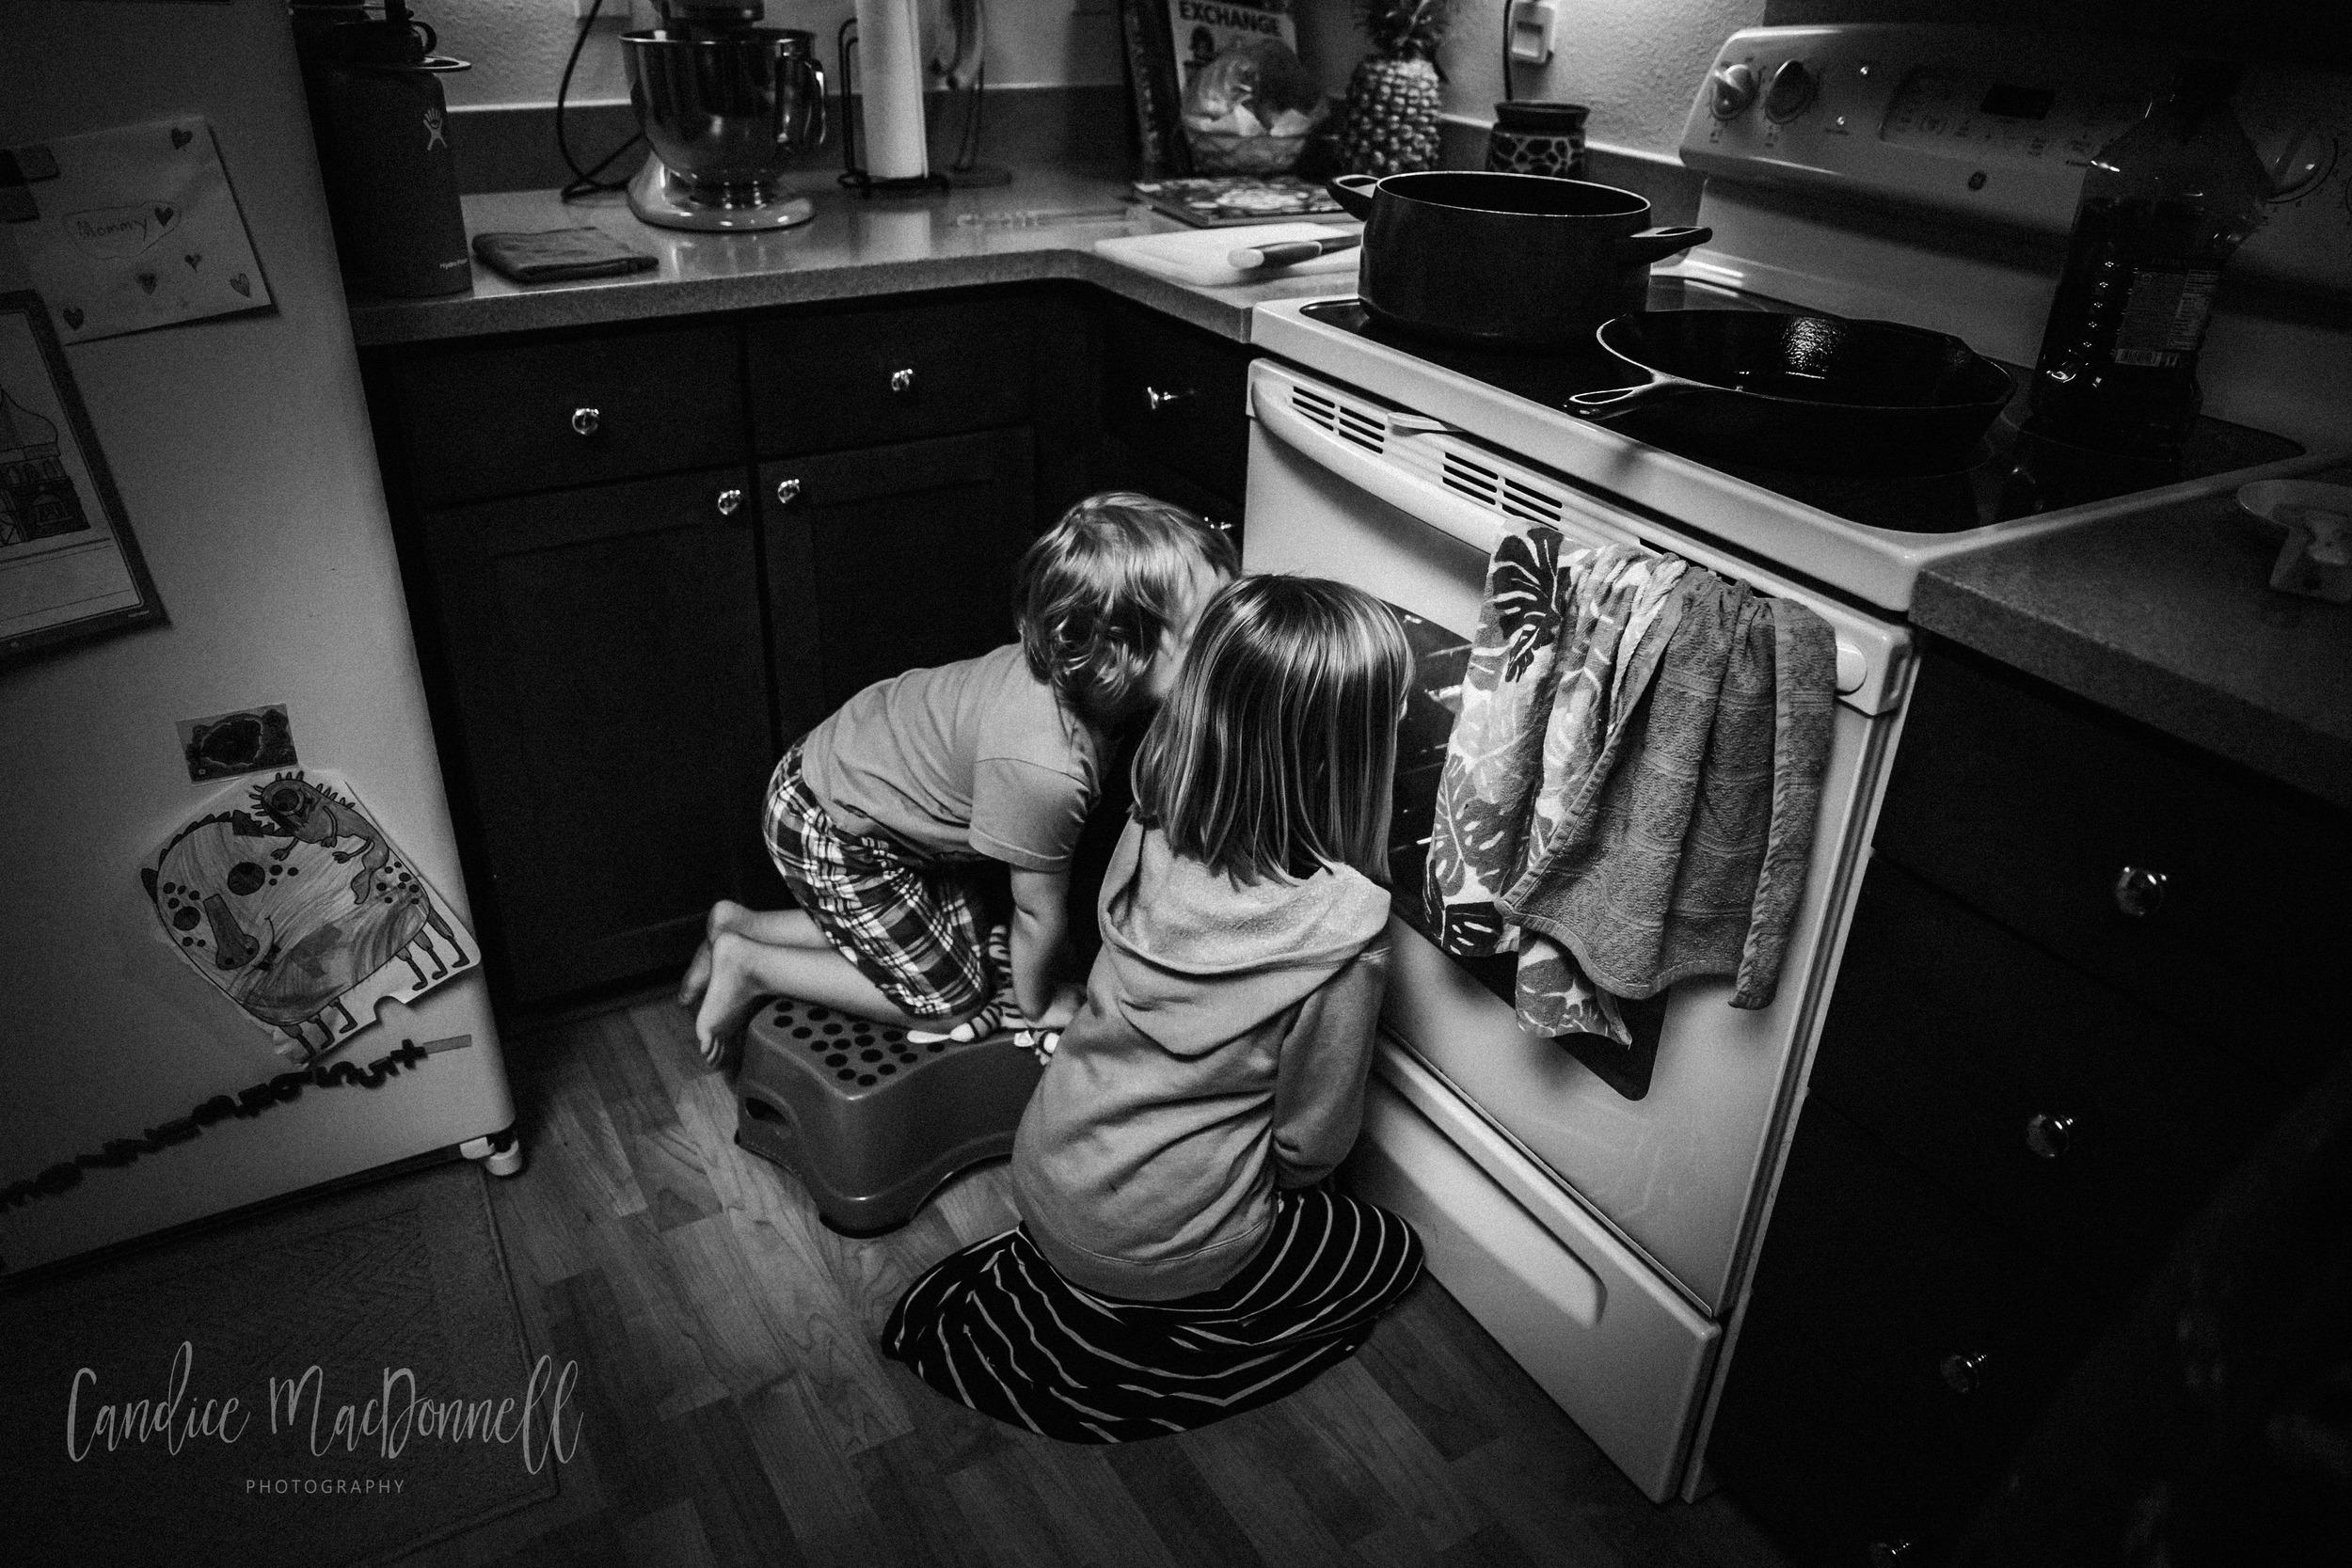 kids-baking-watching-oven-lifestyle-photograph